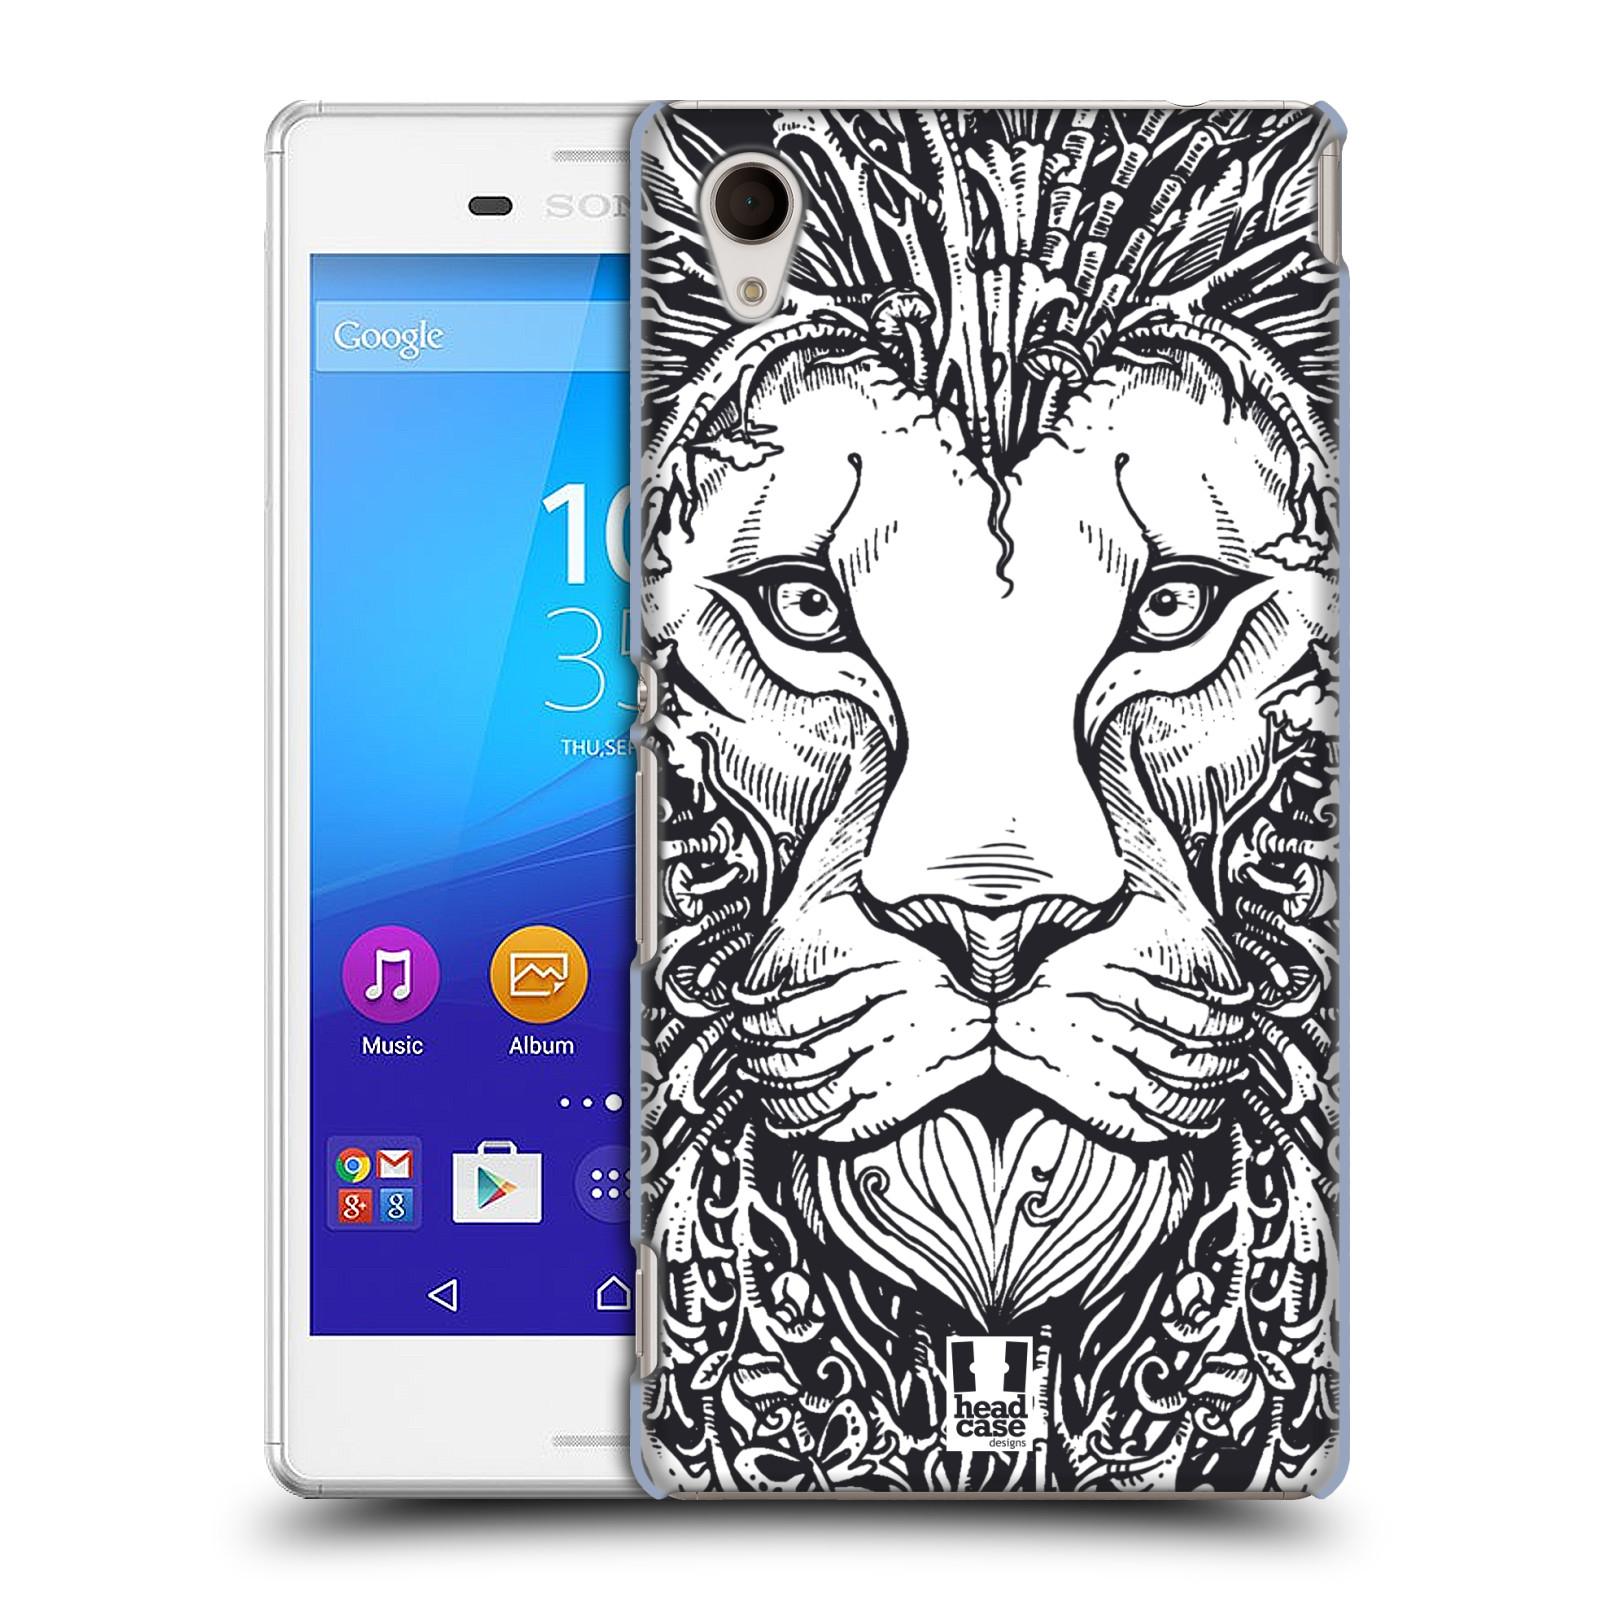 Plastové pouzdro na mobil Sony Xperia M4 Aqua E2303 HEAD CASE DOODLE TVÁŘ LEV (Kryt či obal na mobilní telefon Sony Xperia M4 Aqua a M4 Aqua Dual SIM)